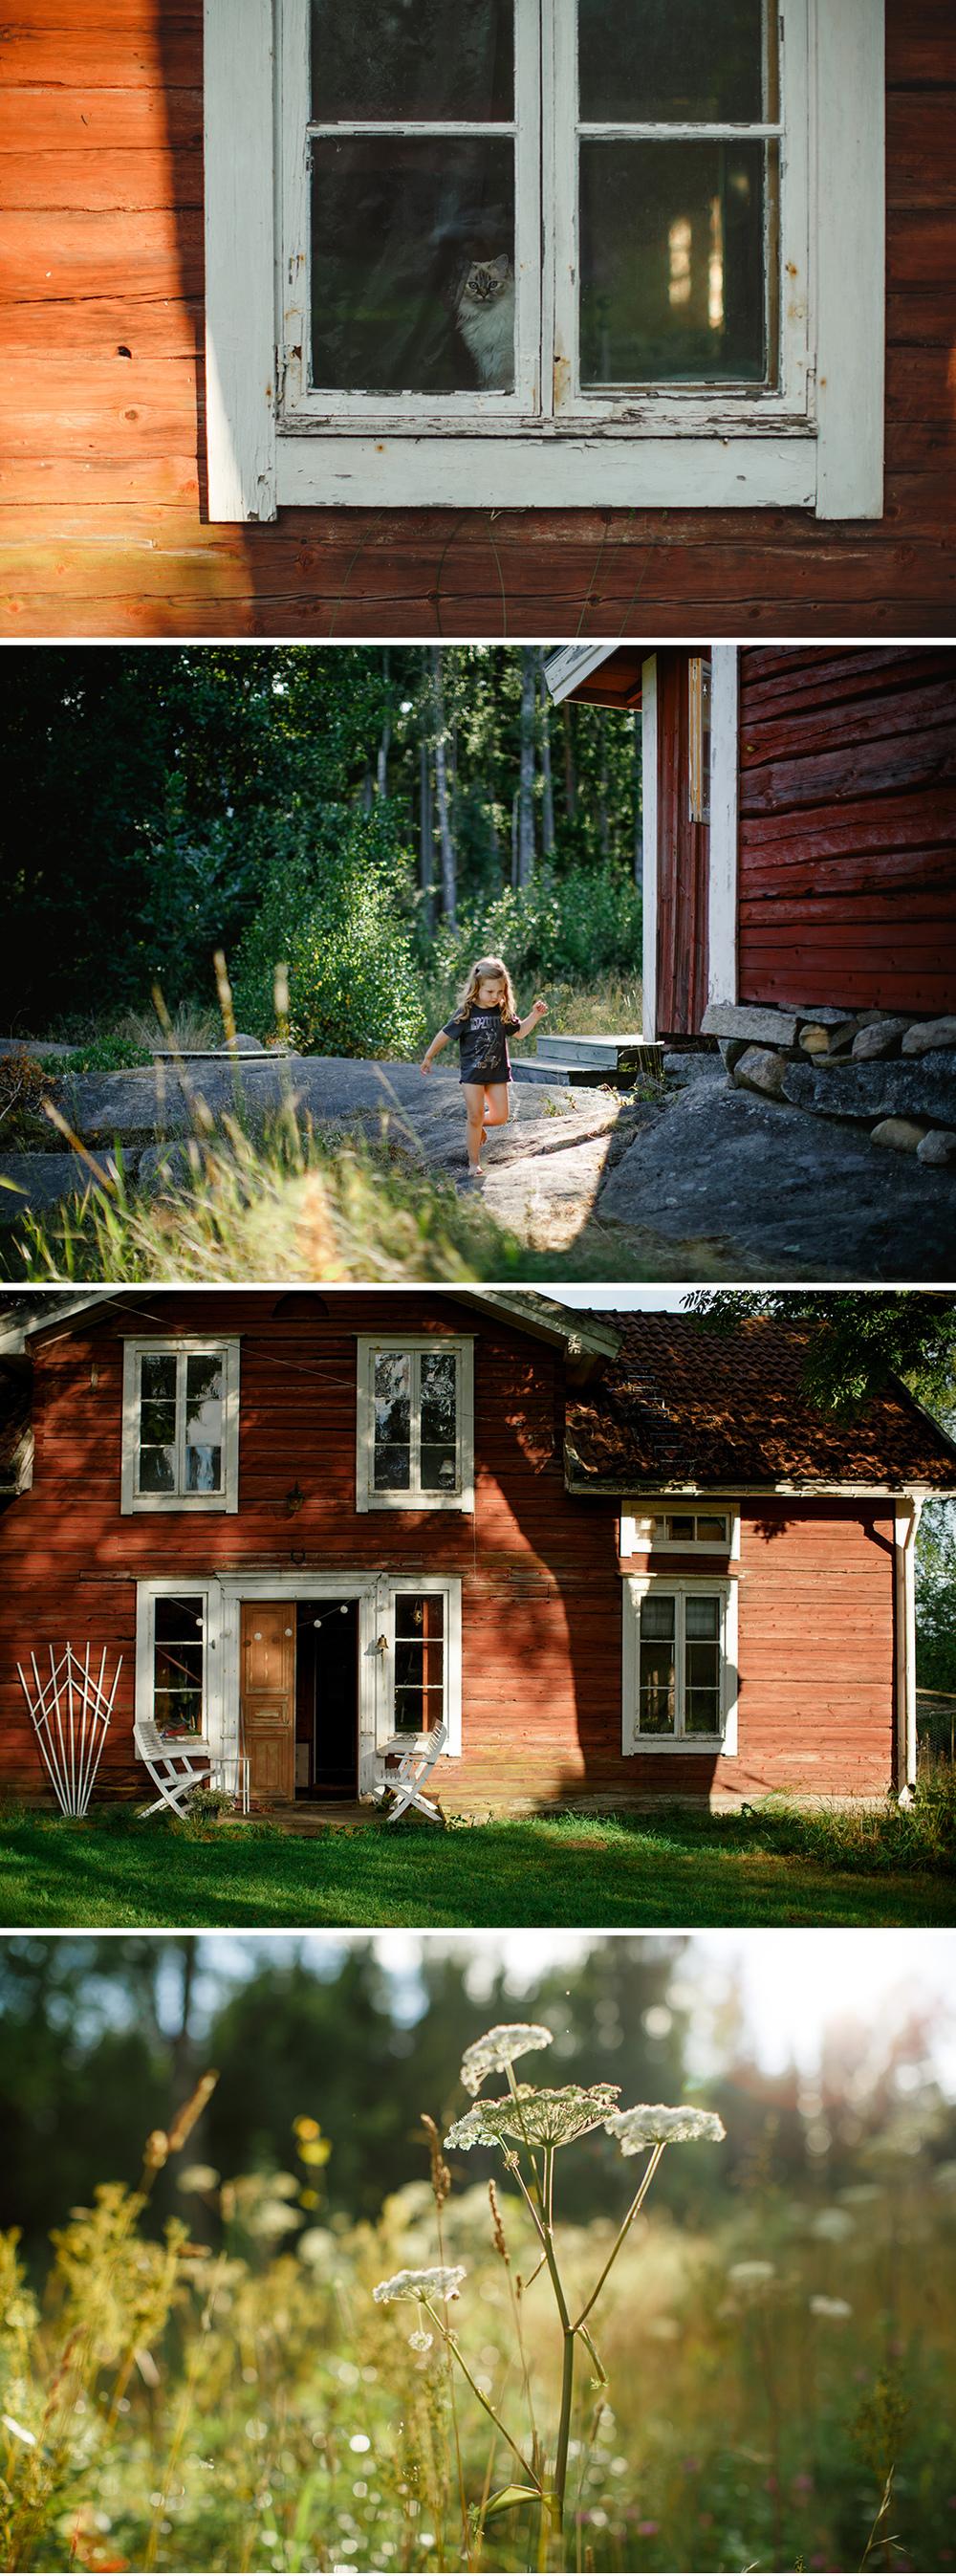 Lifestyle-familjefotografering_Familjefotograf-Anna-Sandstrom-3.jpg